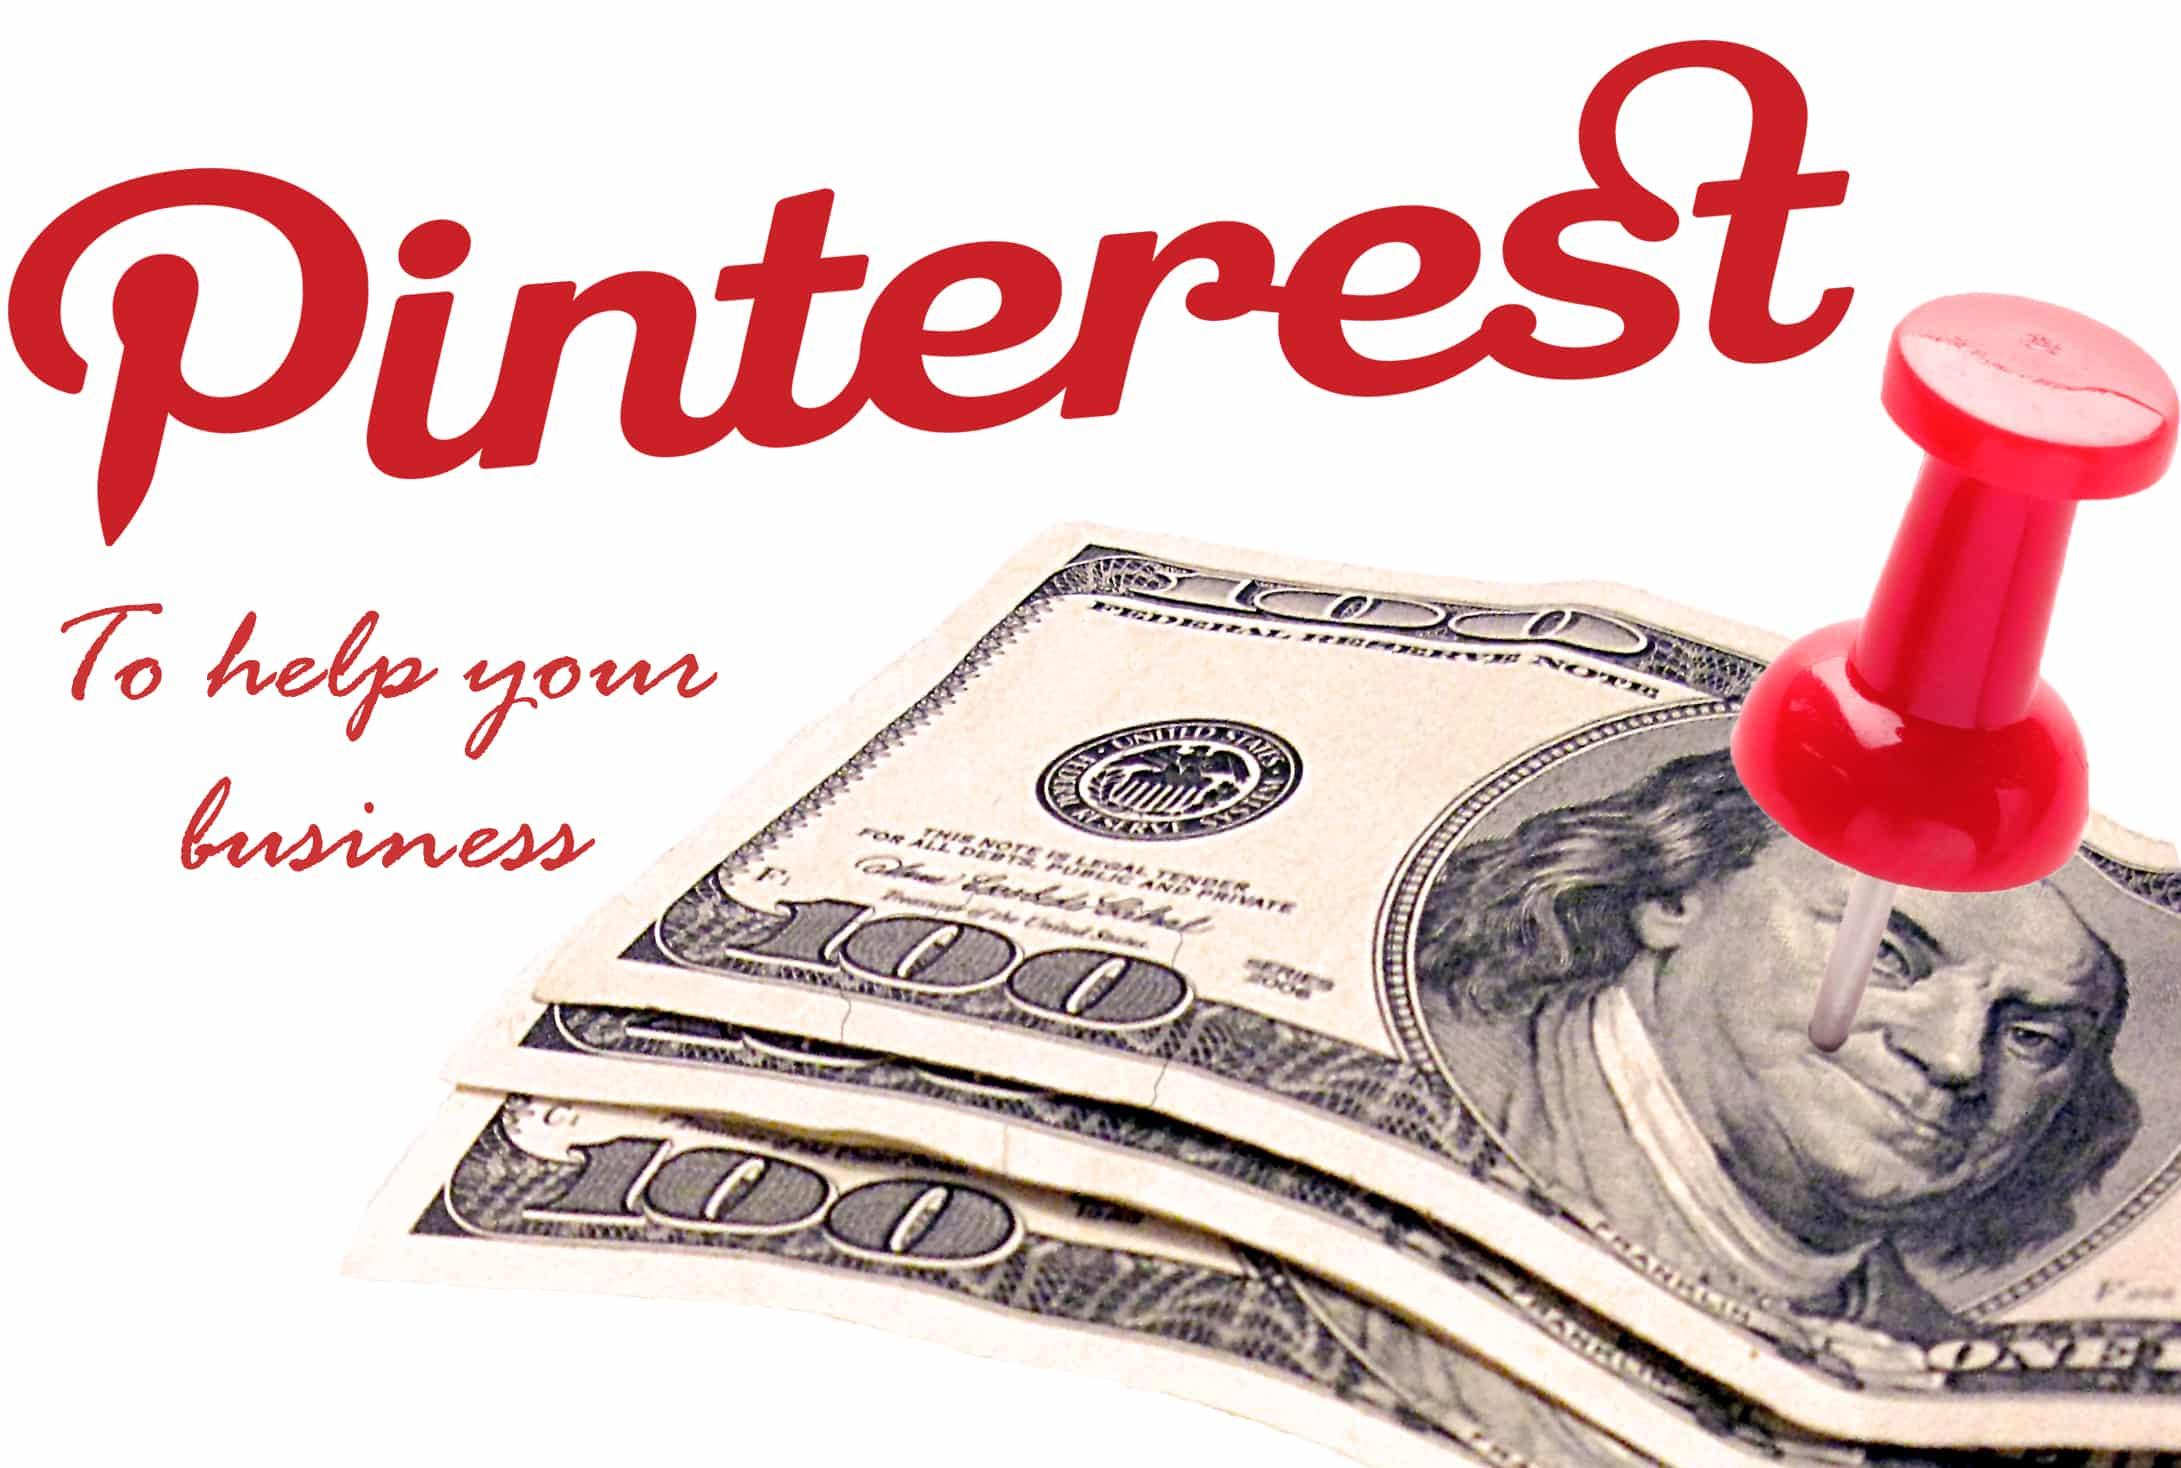 Pinterest-to-increase-your-selling-in-eBay-business شبكة بنترست و التجارة الالكترونية : حقائق و معلومات مثيرة